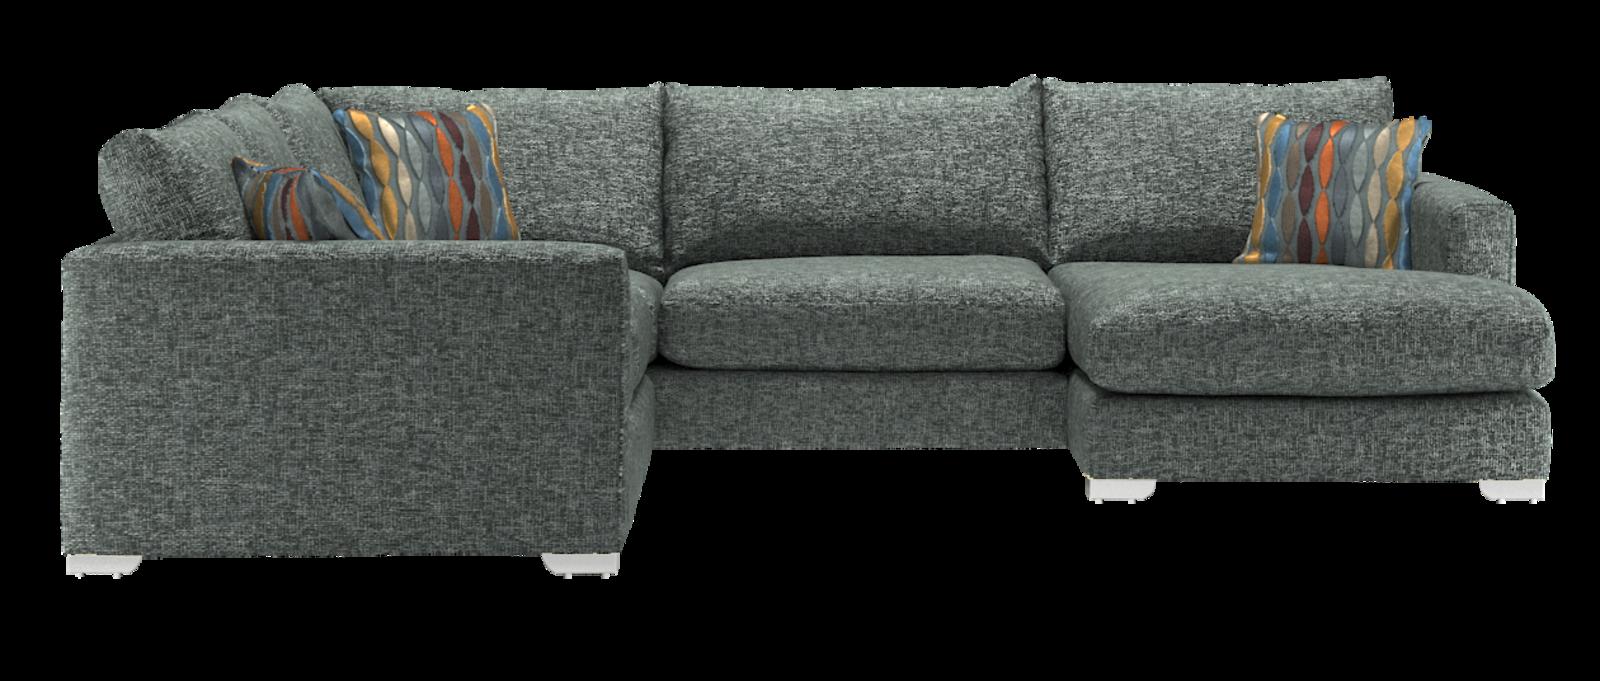 innovative design e1e06 e267a Majestic | Sofology | Sofa Options | Sofa, Home Decor, Furniture